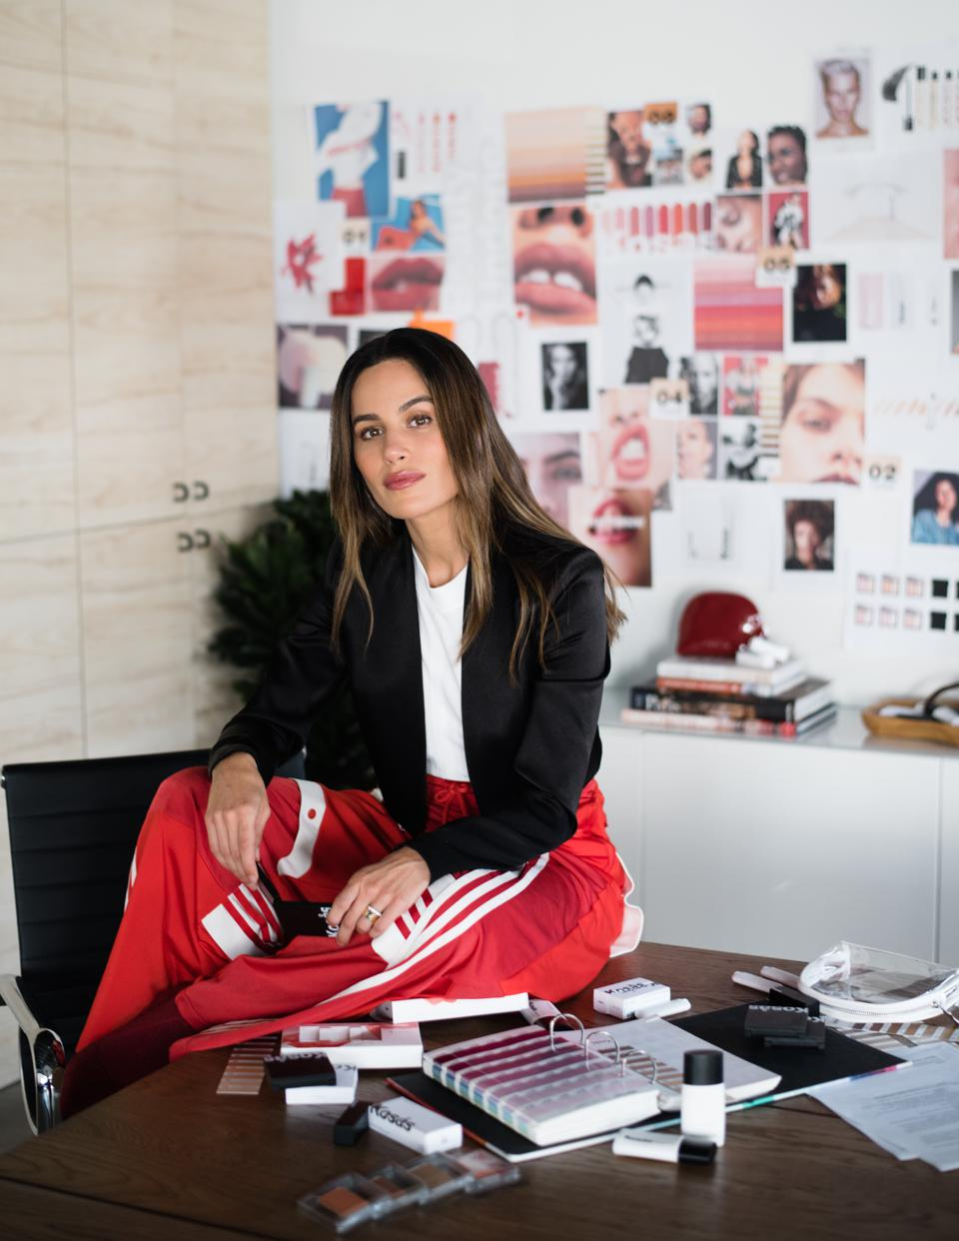 Sheena Yaitanes, founder of Kosas